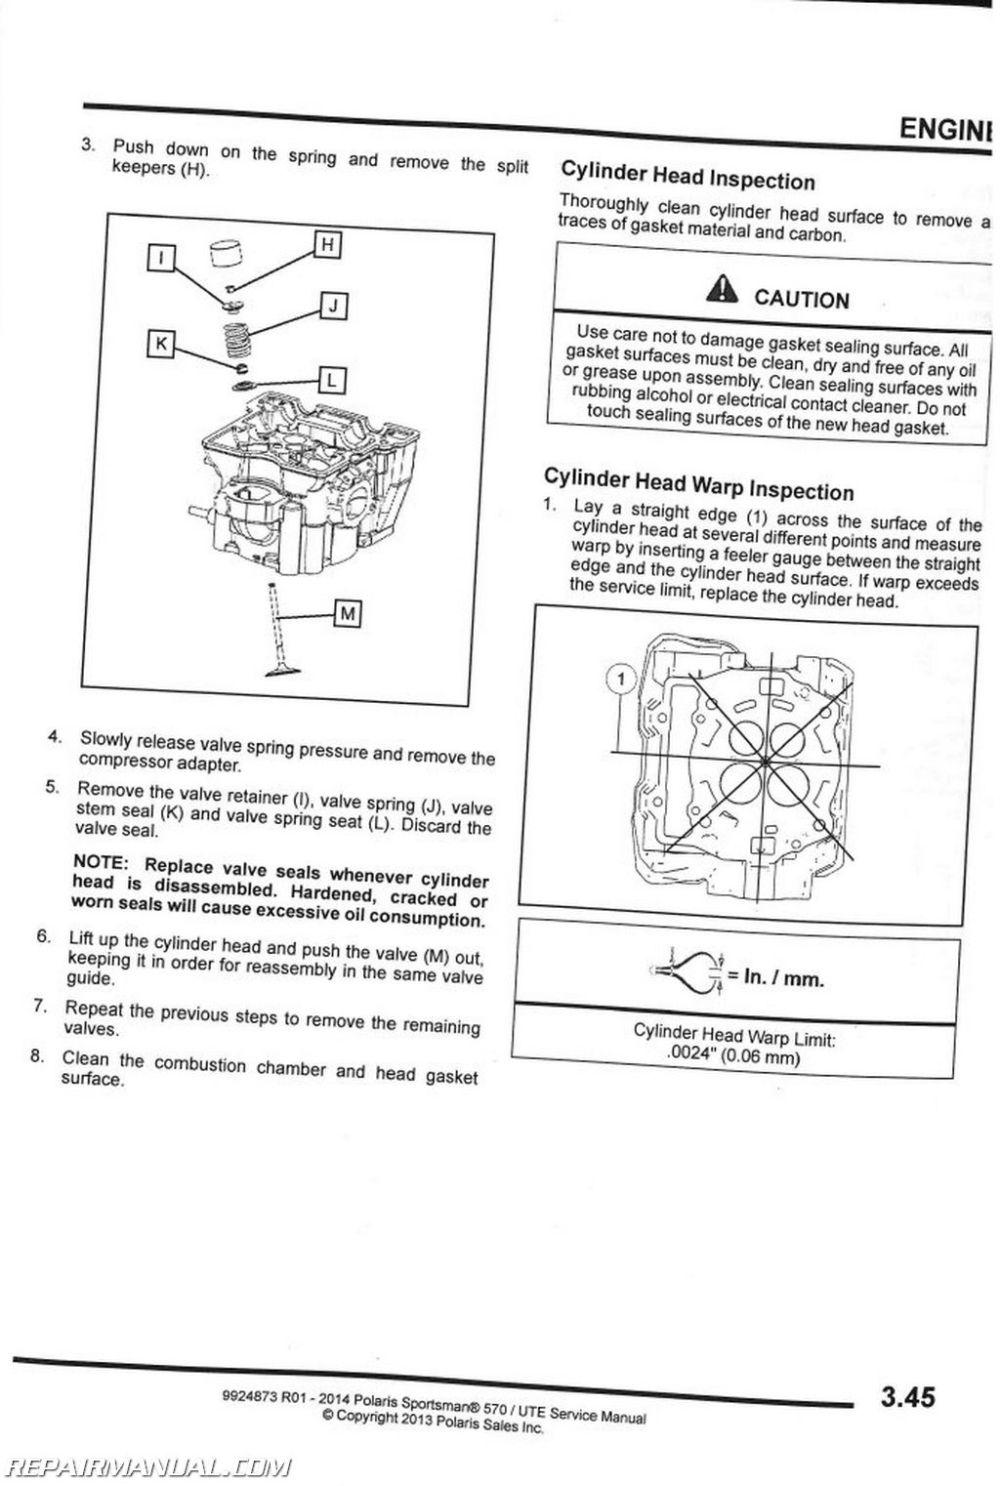 medium resolution of wiring diagram 2016 polari ranger 570